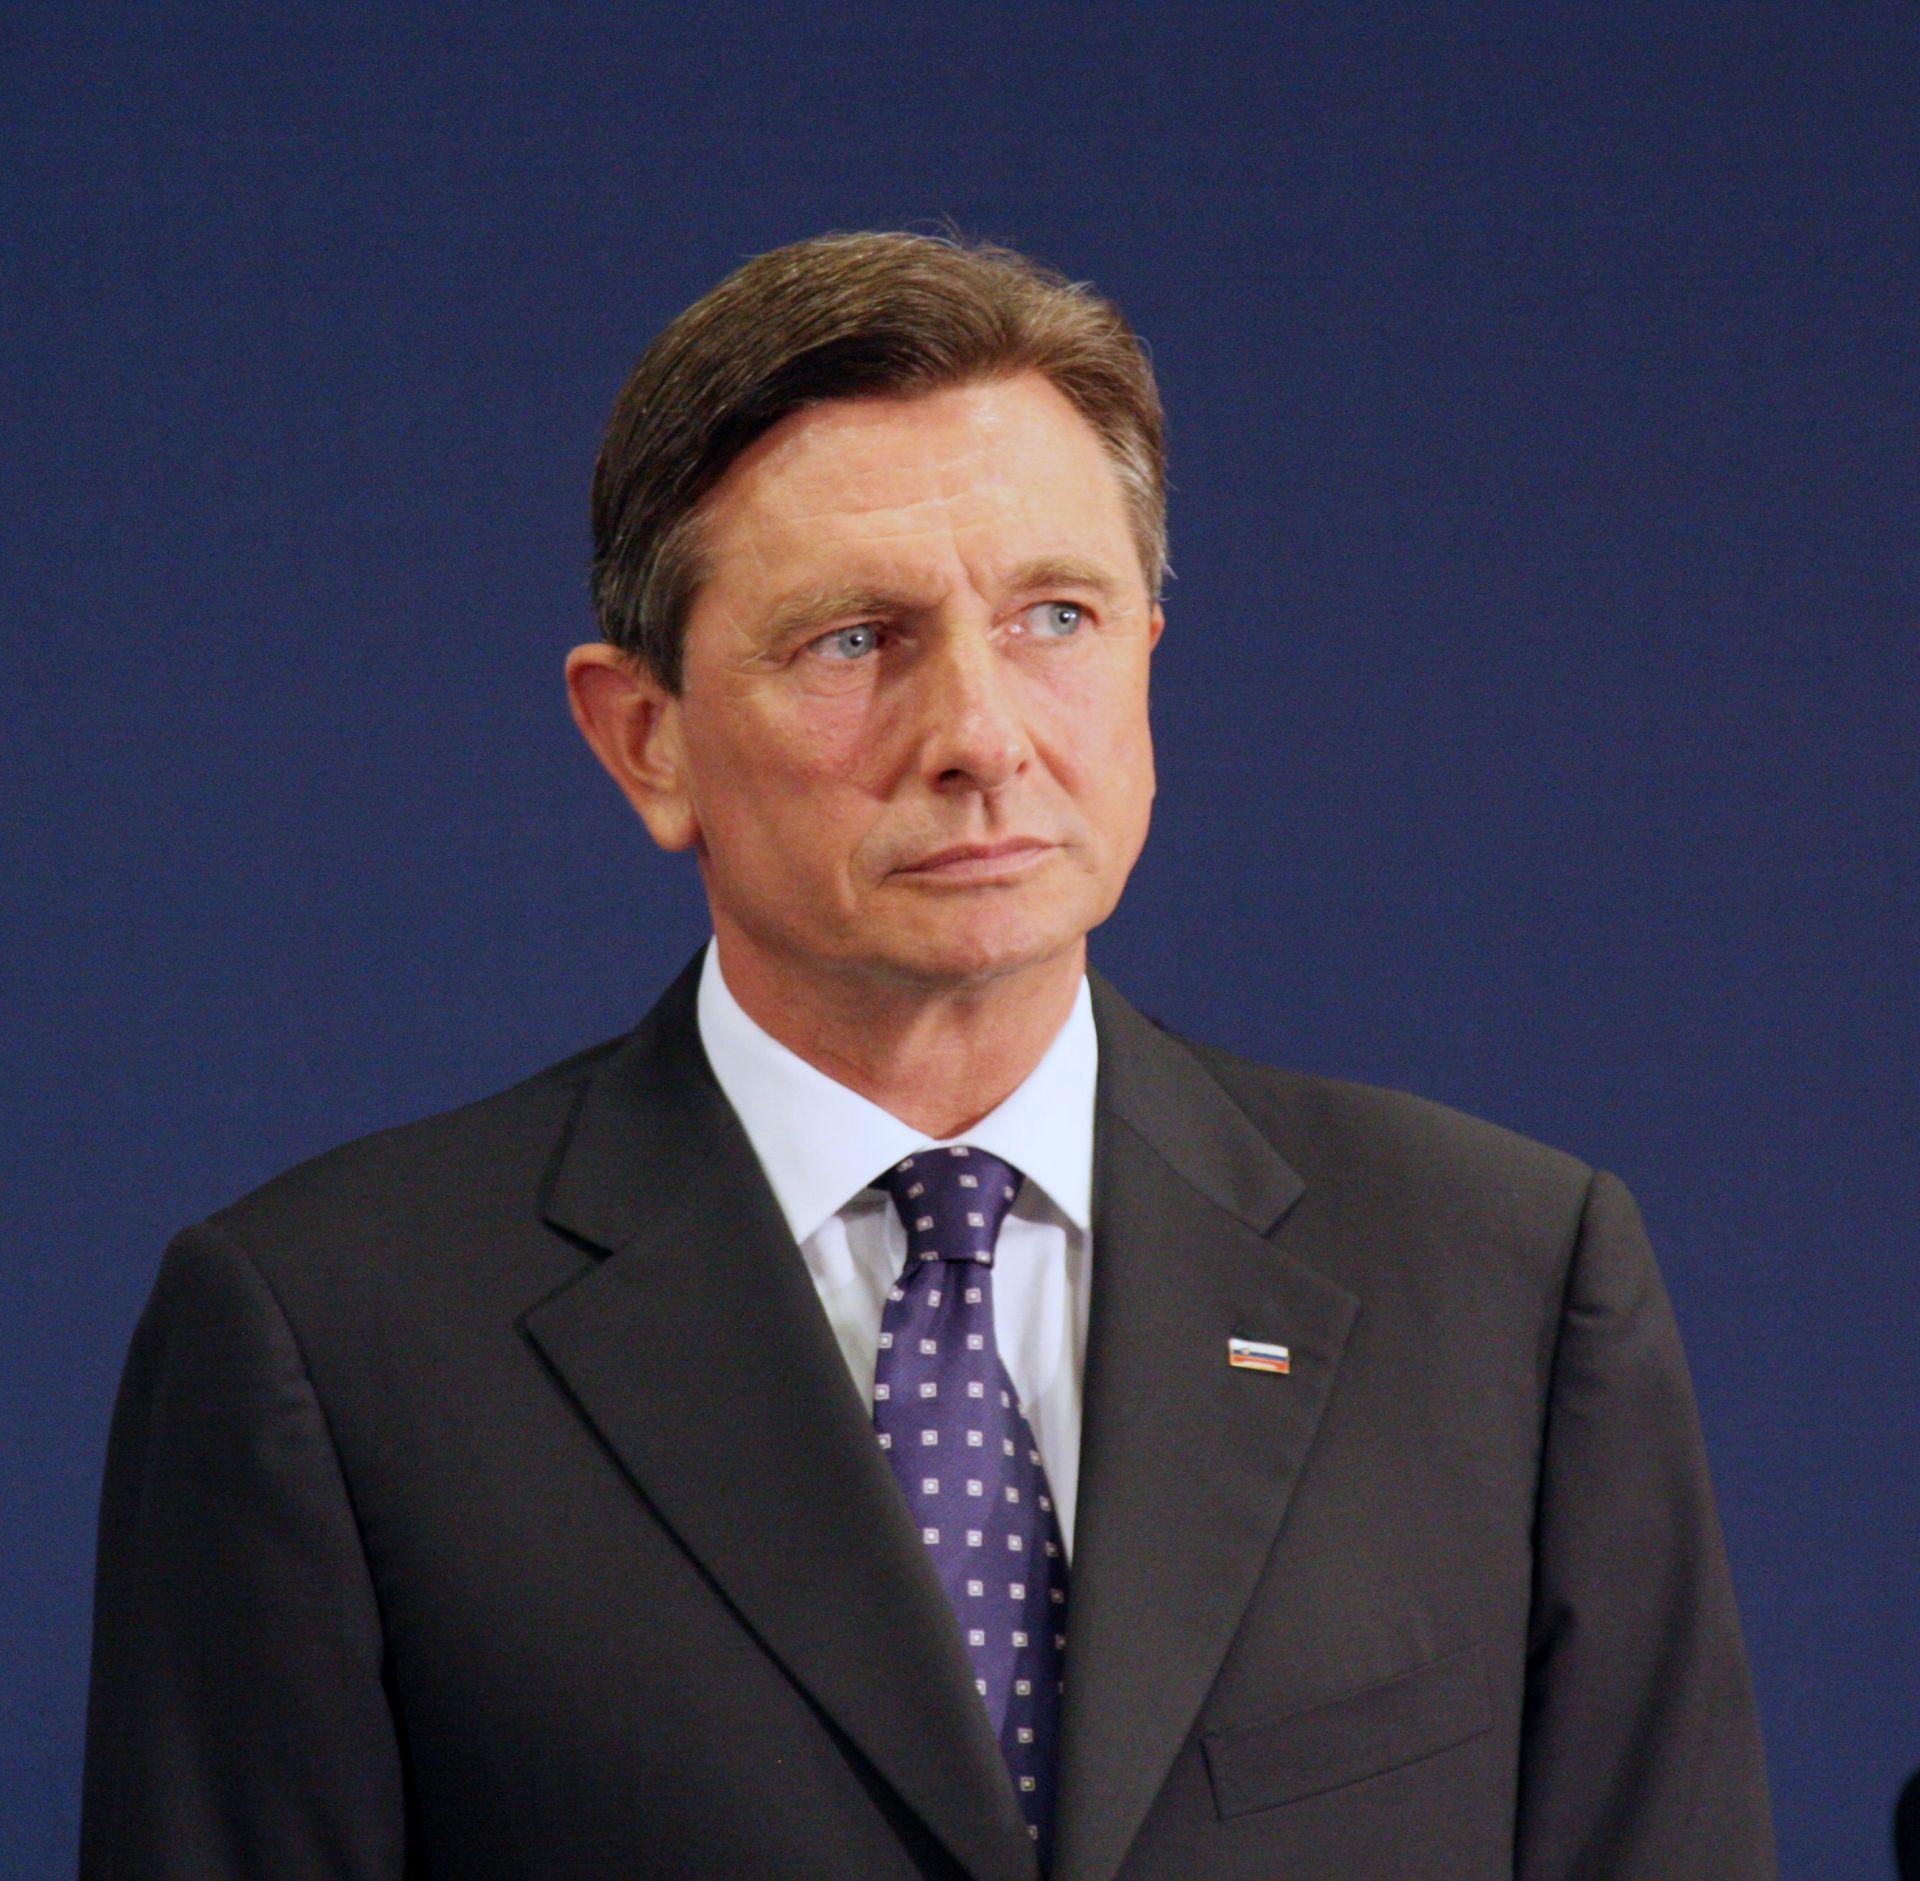 Pahor telefonski razgovarao s turskim predsjednikom Erdoganom